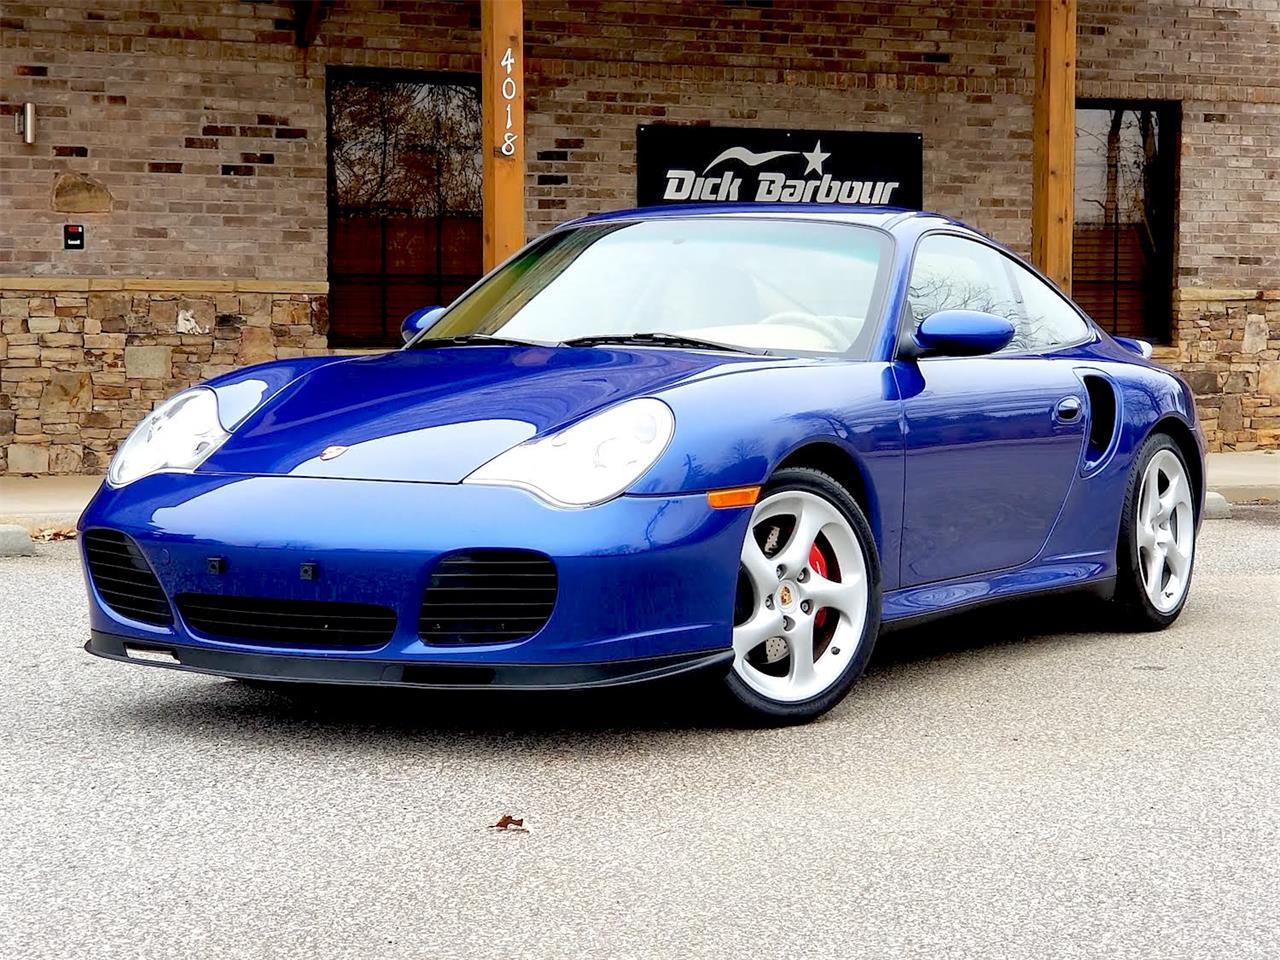 2001 Porsche 911 Turbo For Sale Classiccarscom Cc 1175697